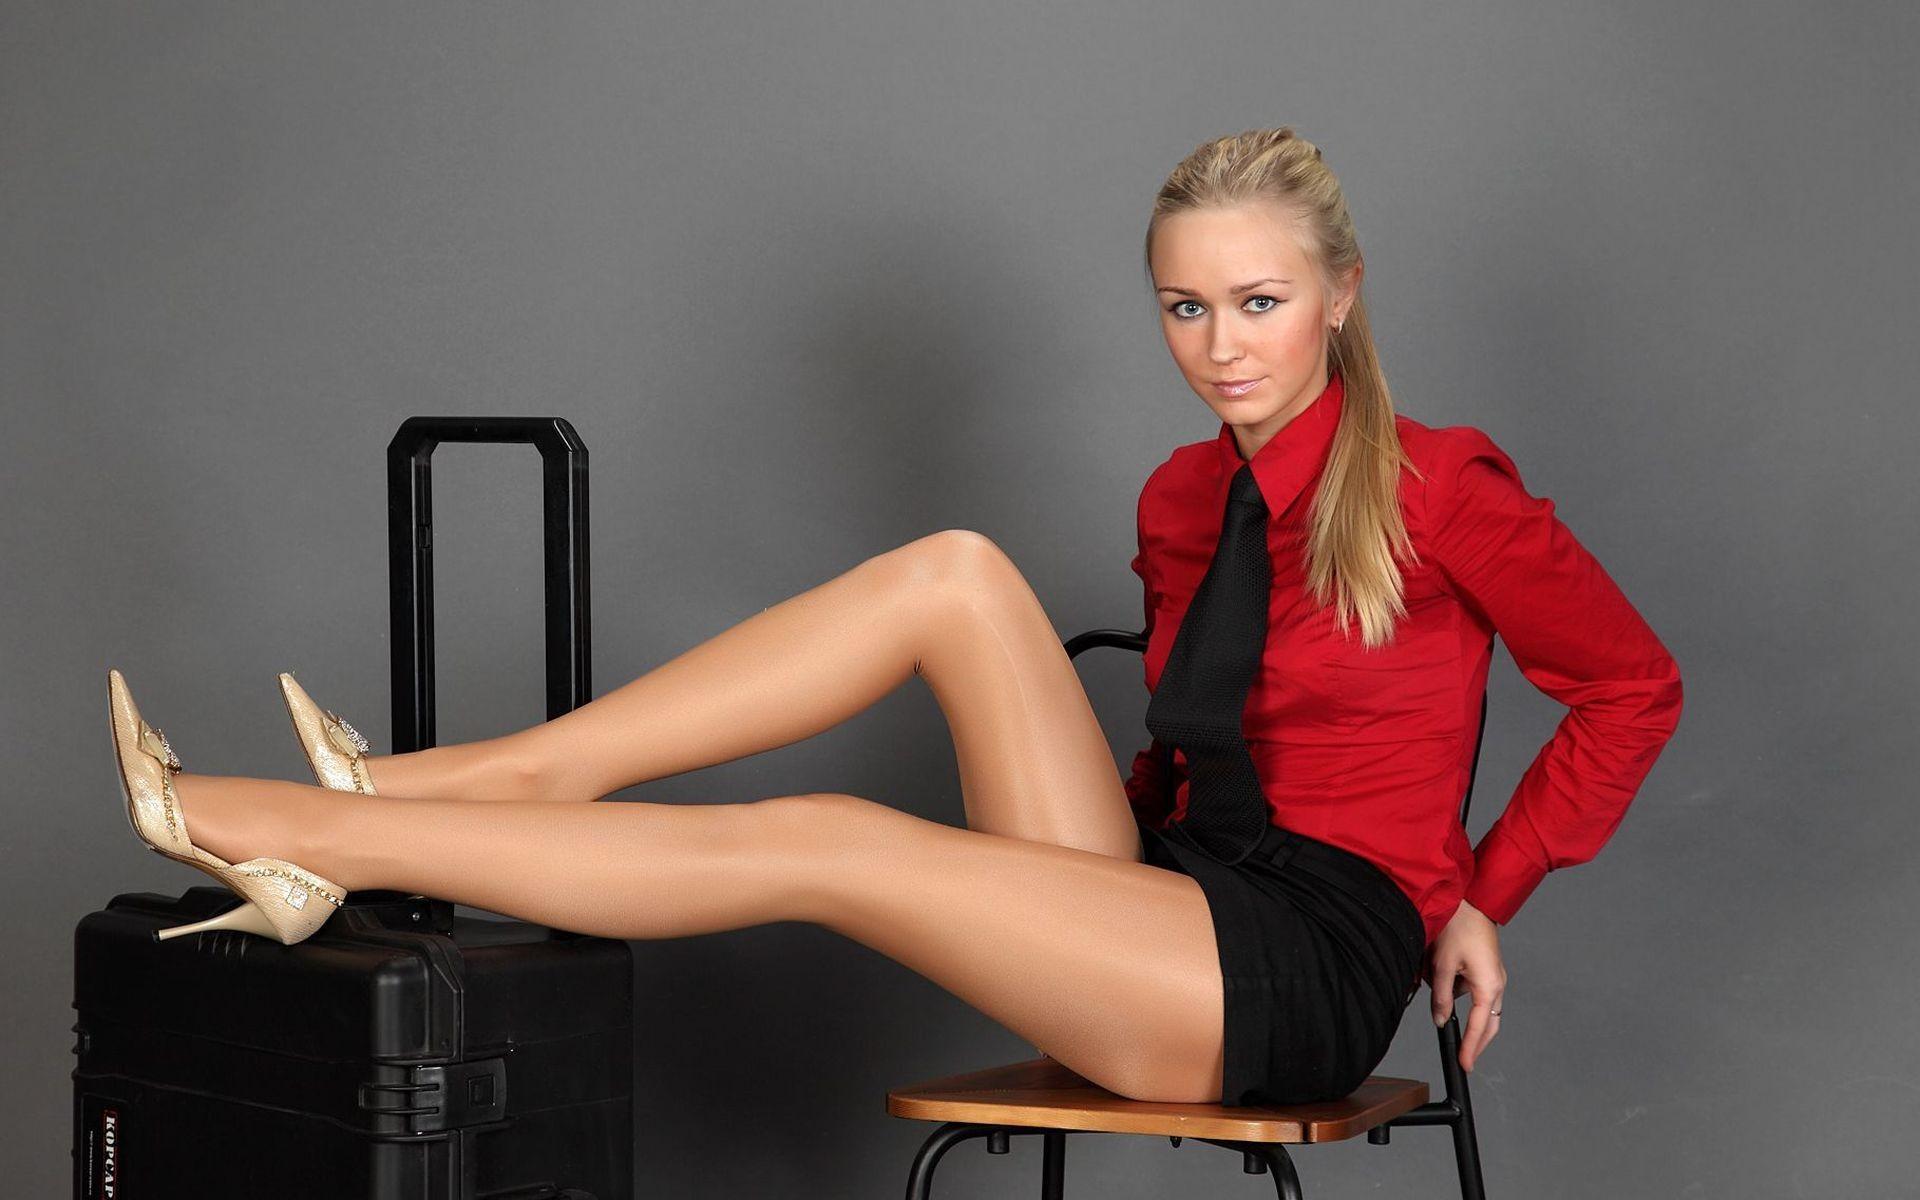 women in pantyhose and heels